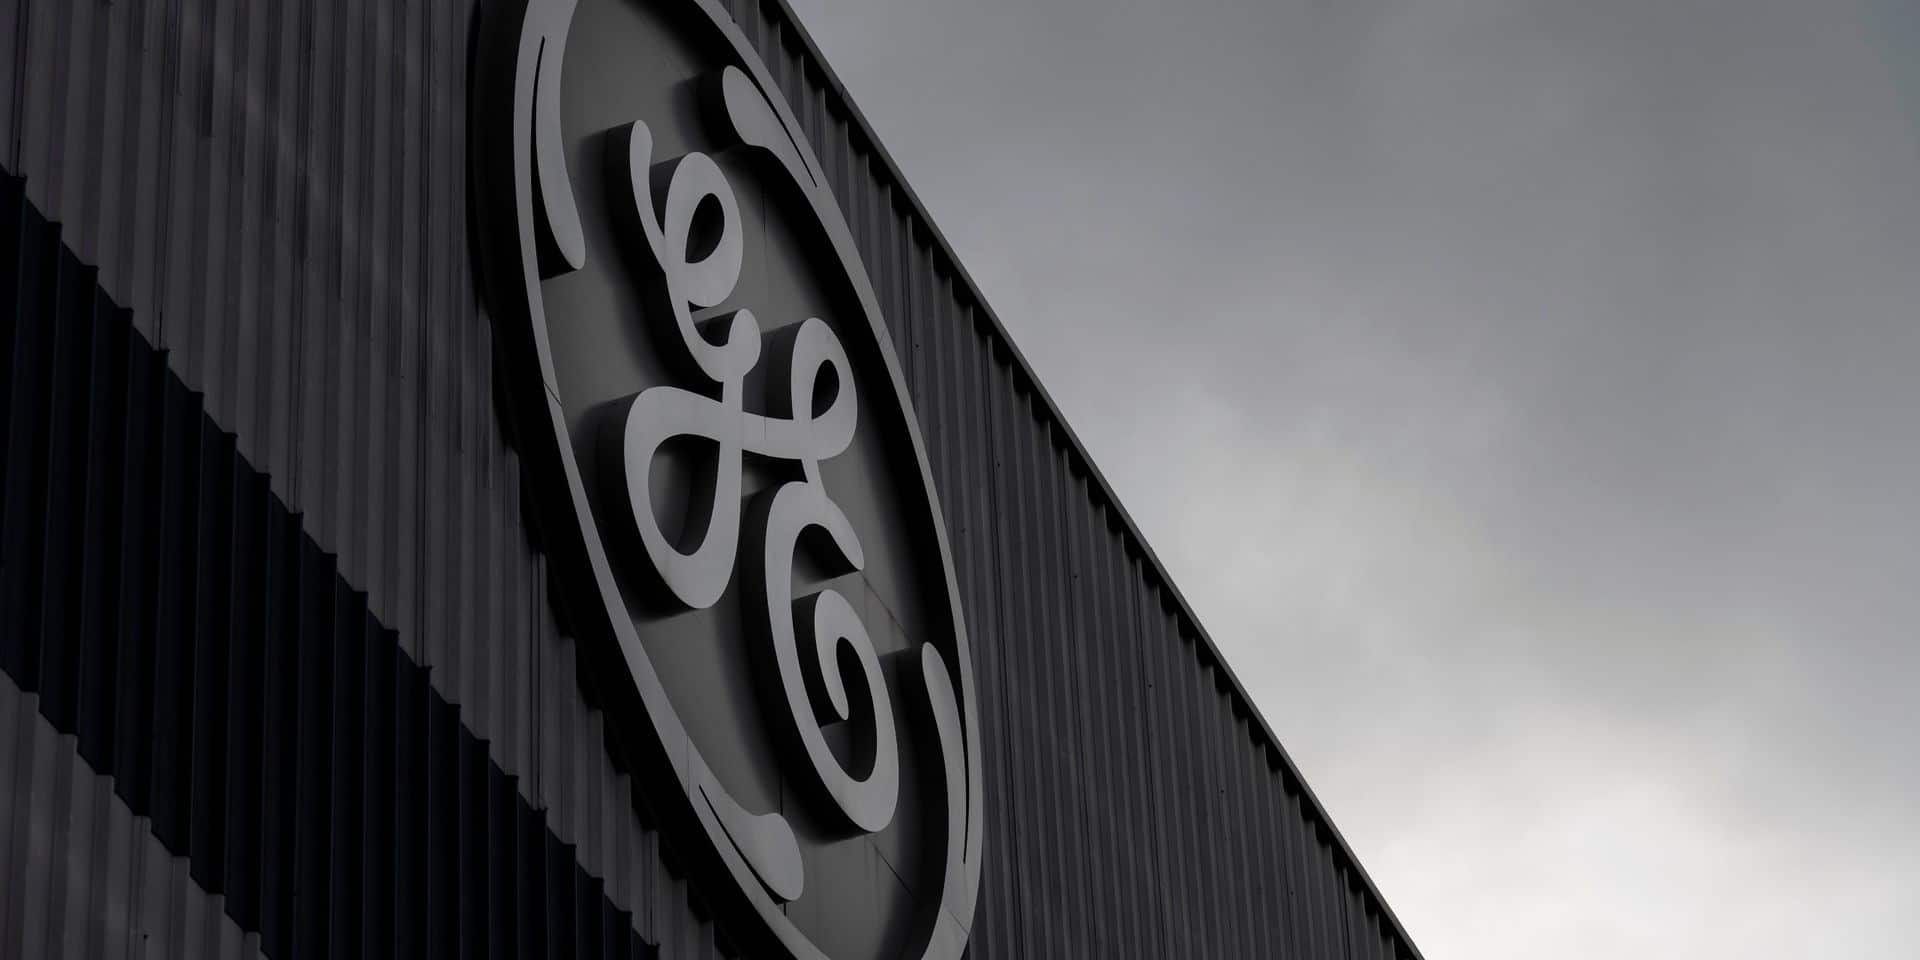 General Electric veut fermer son site carolo